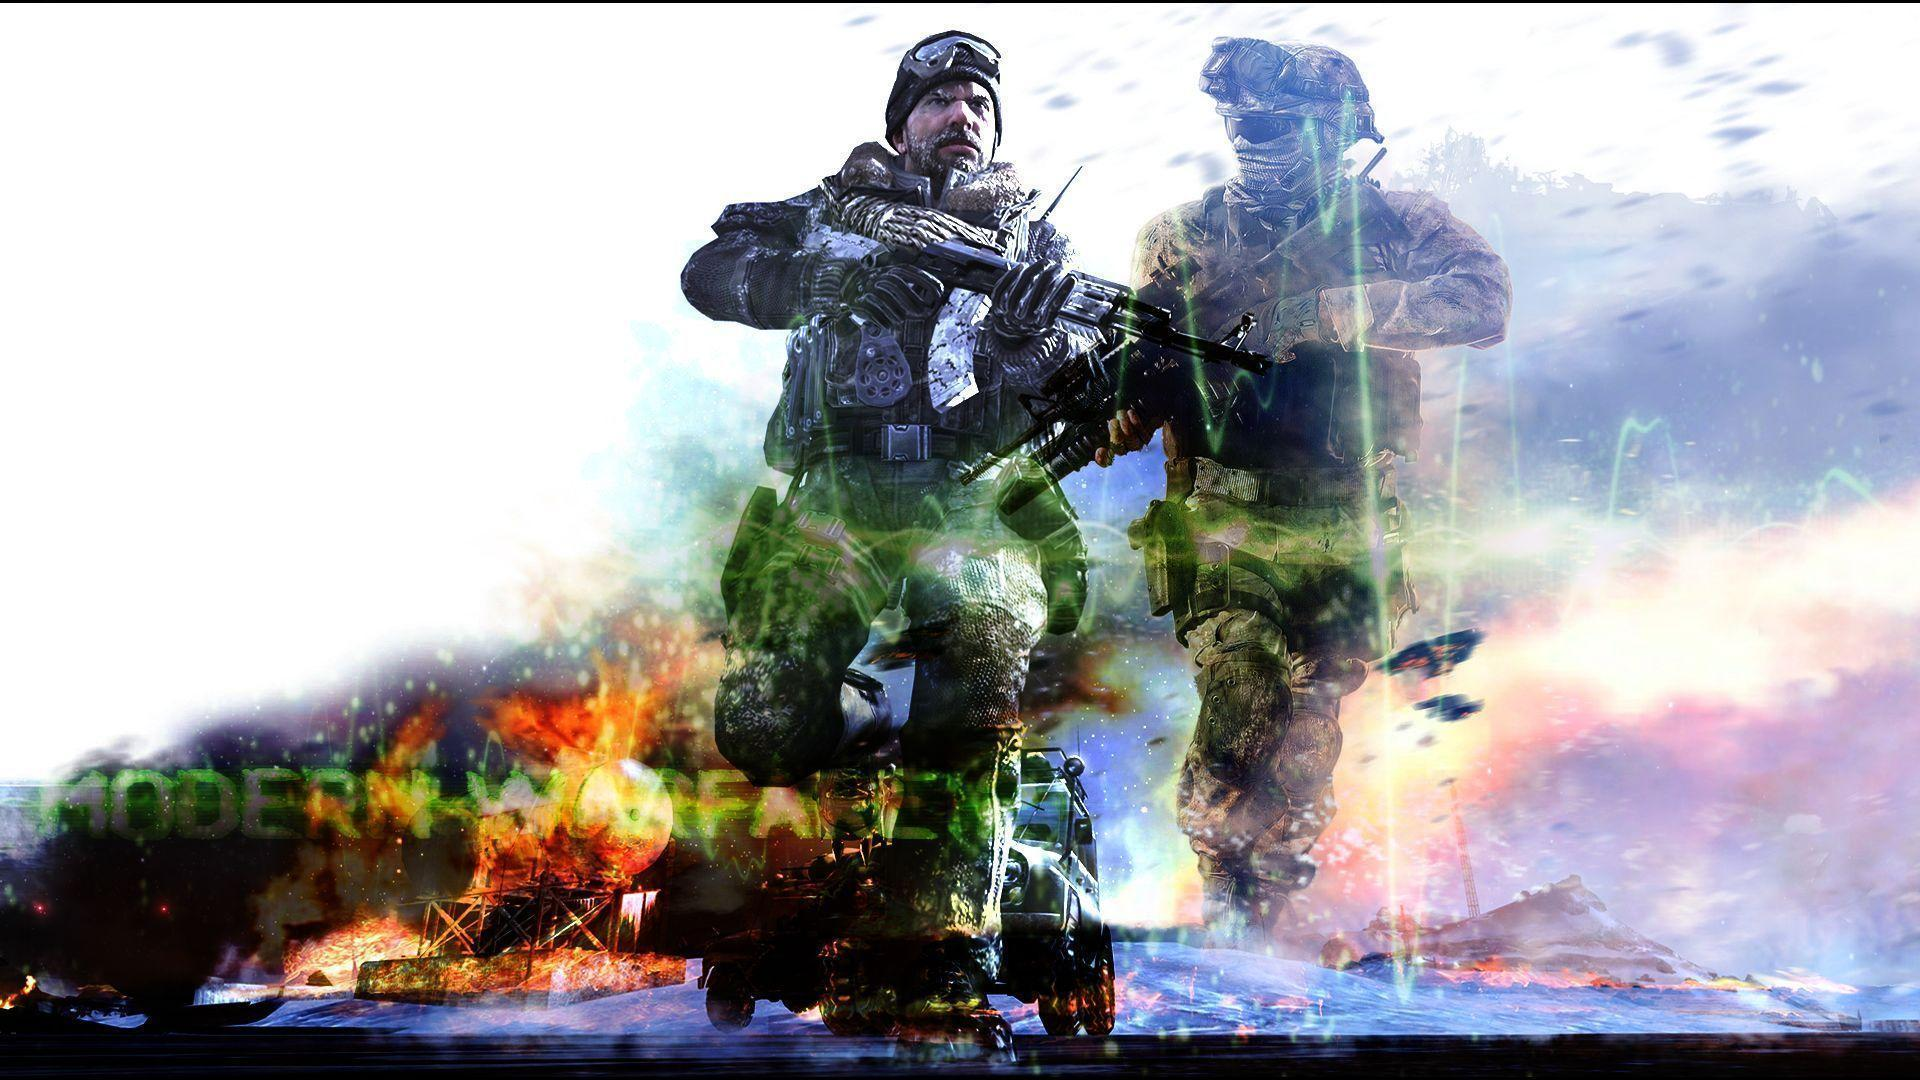 Call Of Duty: Modern Warfare 2 Wallpapers - Wallpaper Cave